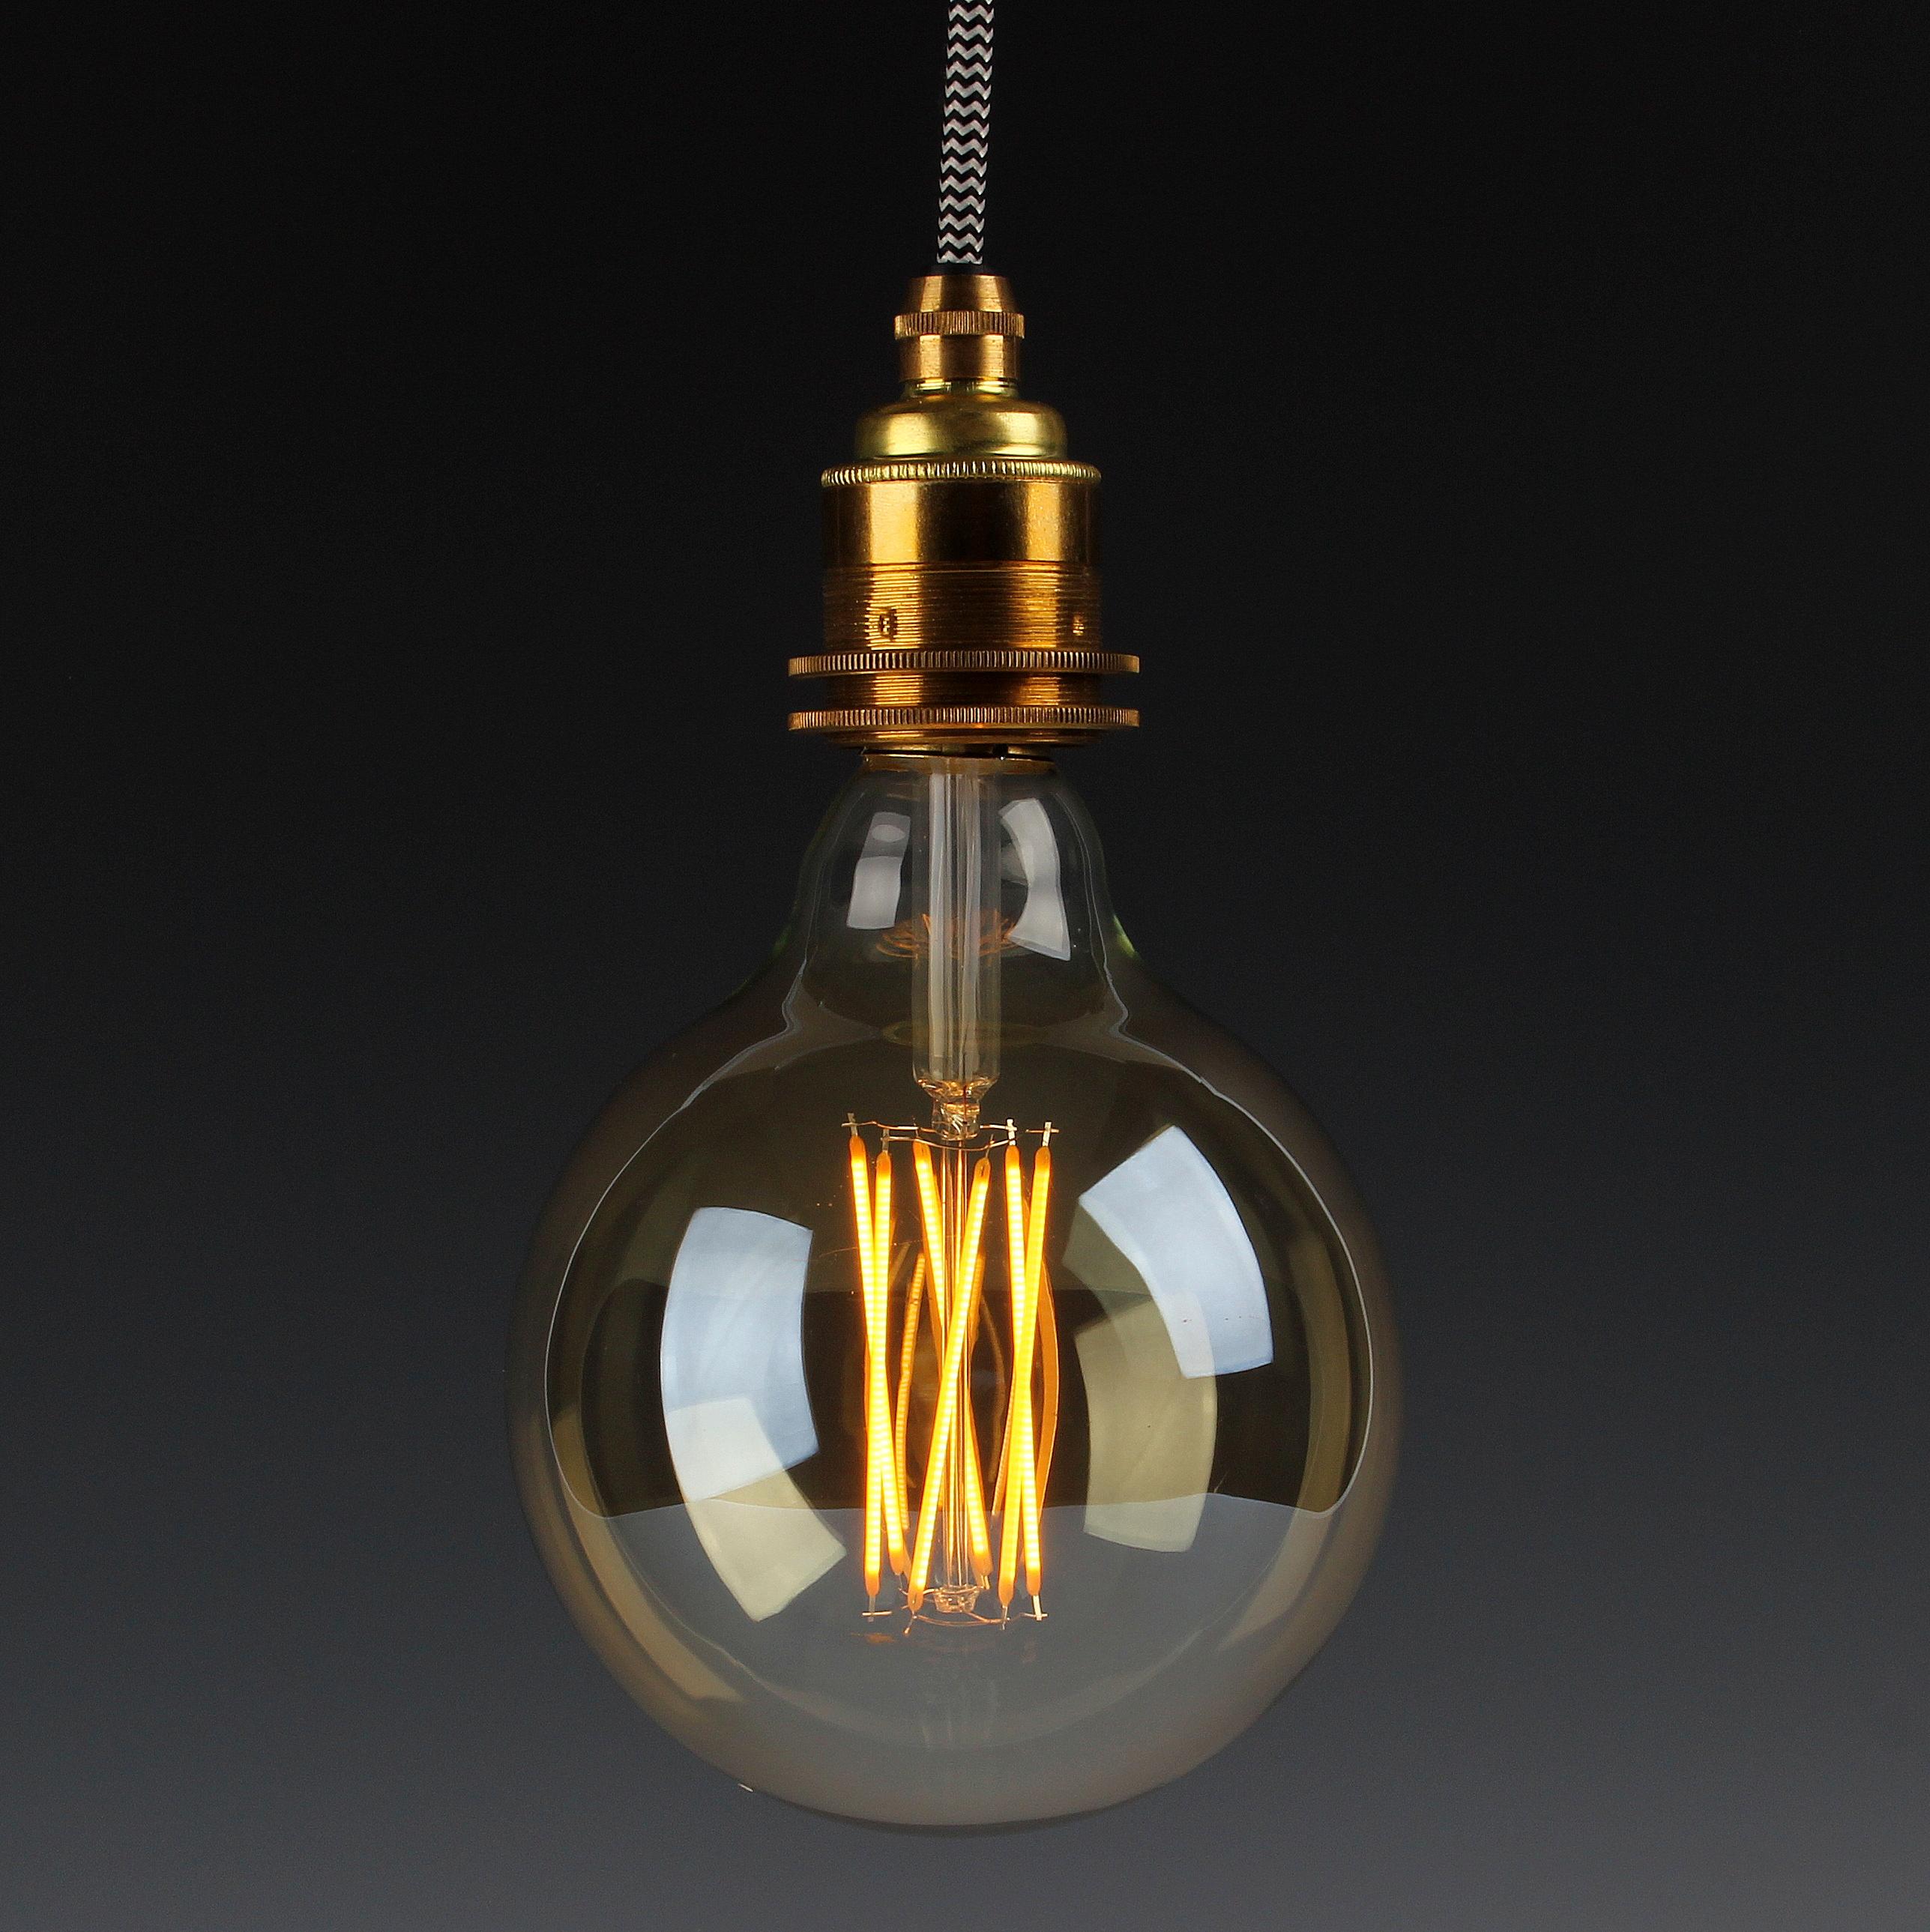 danlamp mega edison gold e27 deko led leuchtmittel 1 radio k lsch hamburg. Black Bedroom Furniture Sets. Home Design Ideas